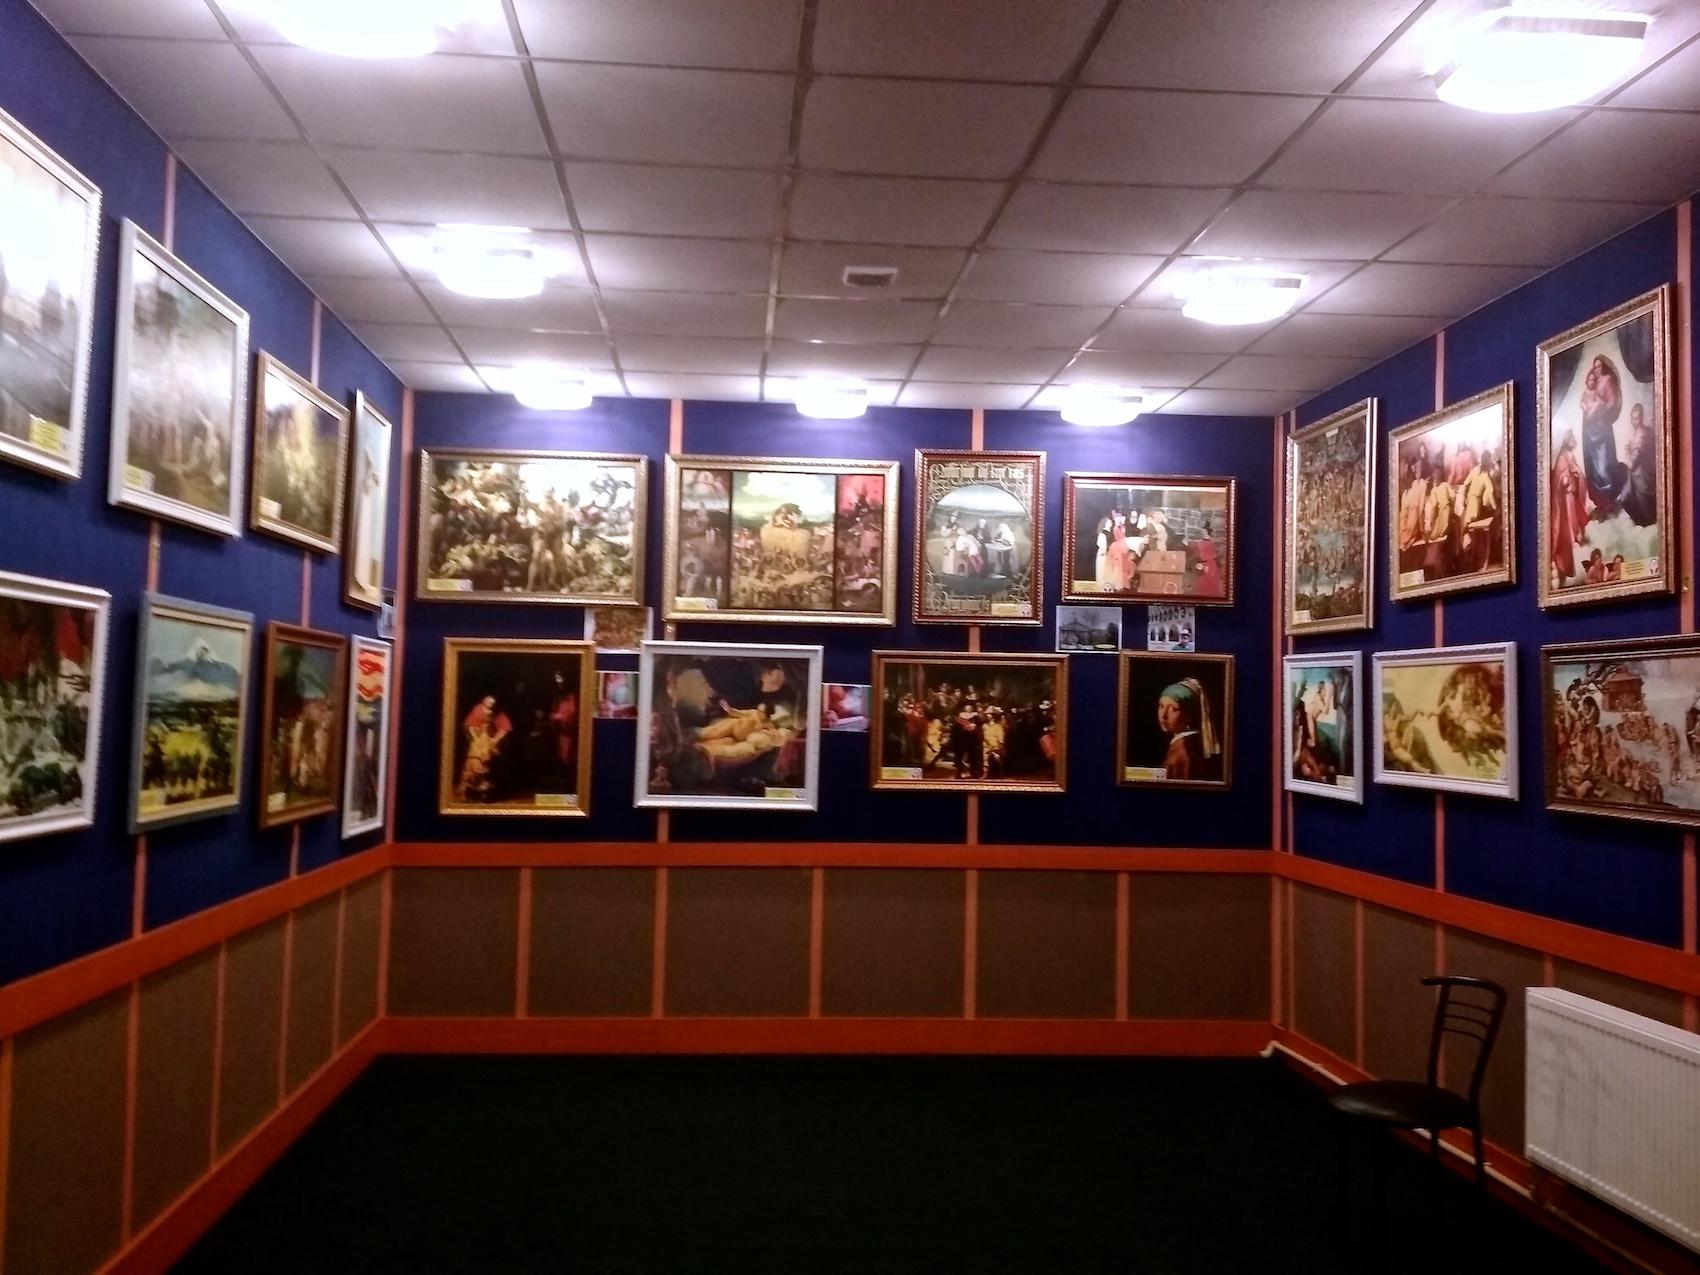 Mystectvo dlja pryfrontovogo mista — istorija interaktyvnoї galereї u Družkivci